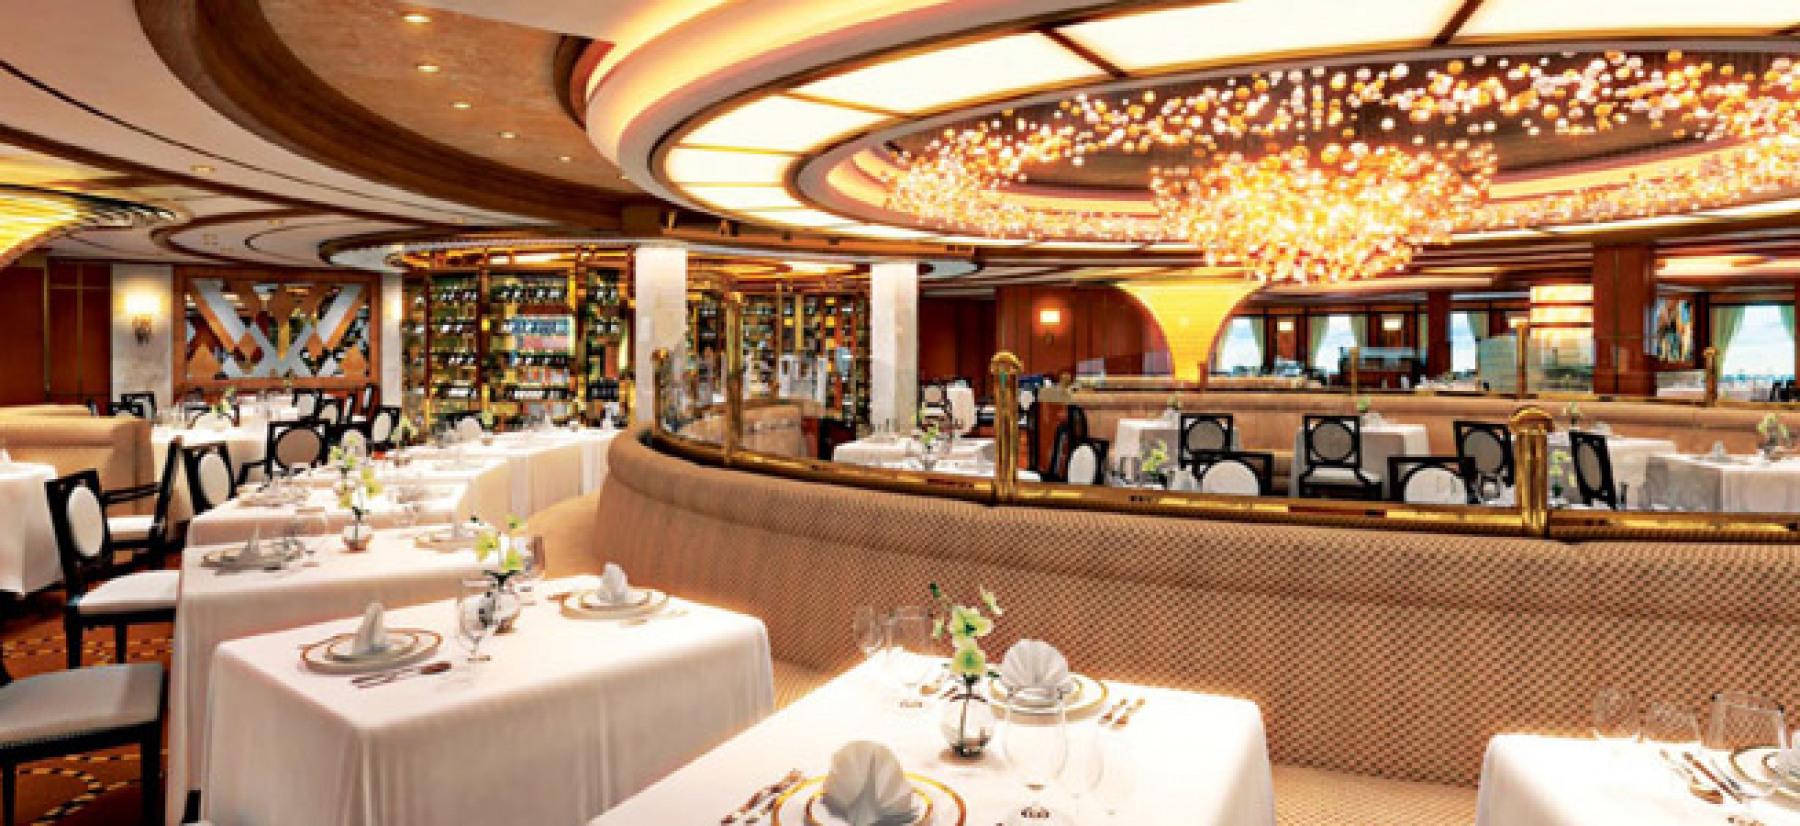 Princess Cruises Royal Class Interior traditional dining.jpg